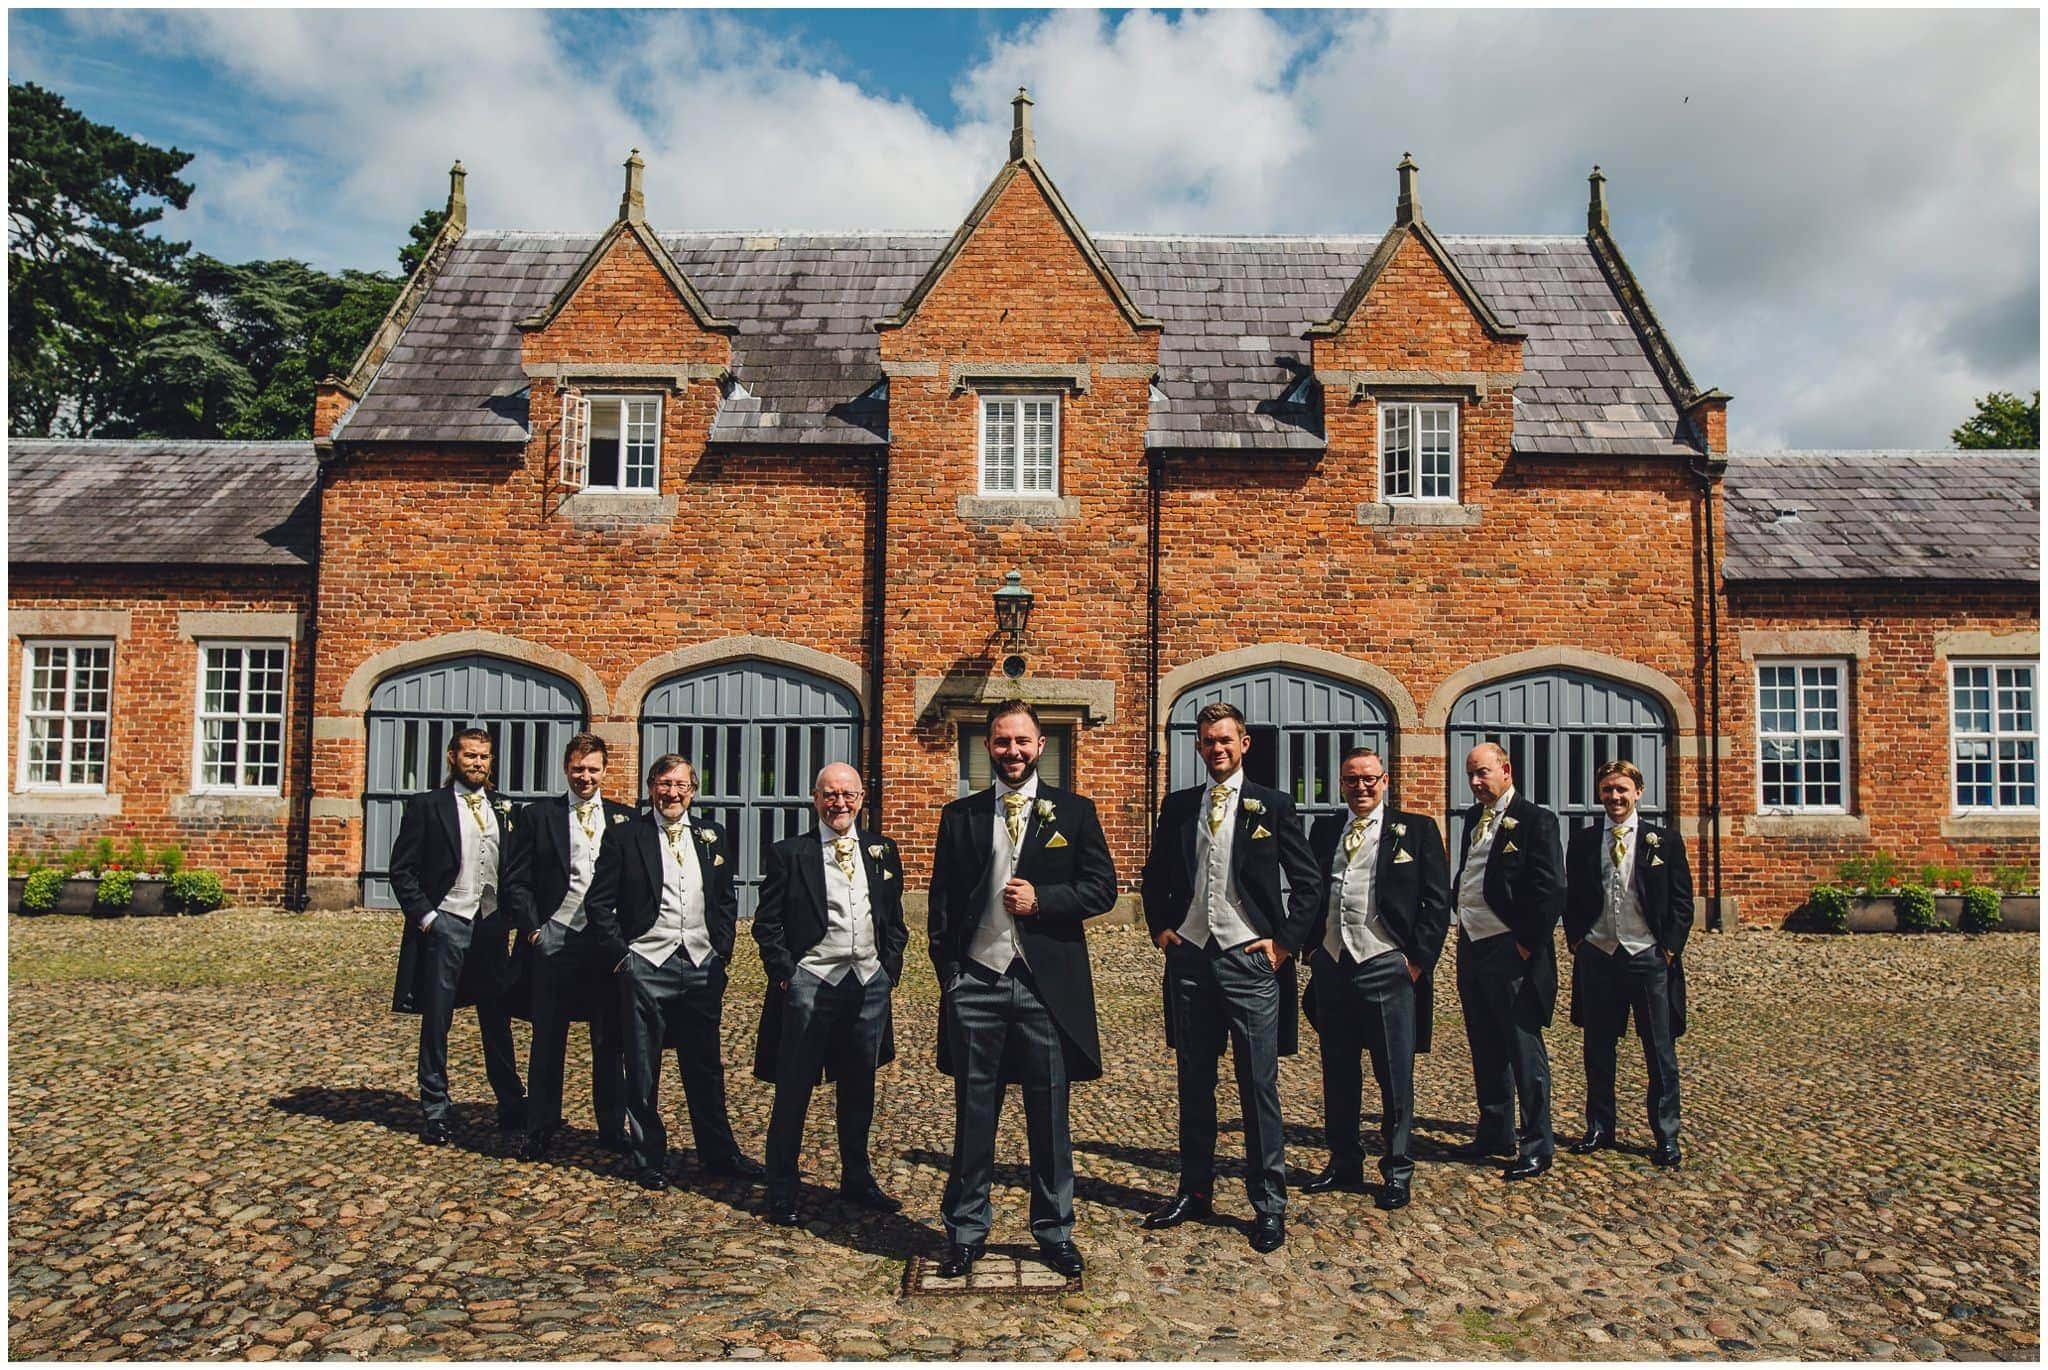 combermere-abbey-wedding-photographer-32